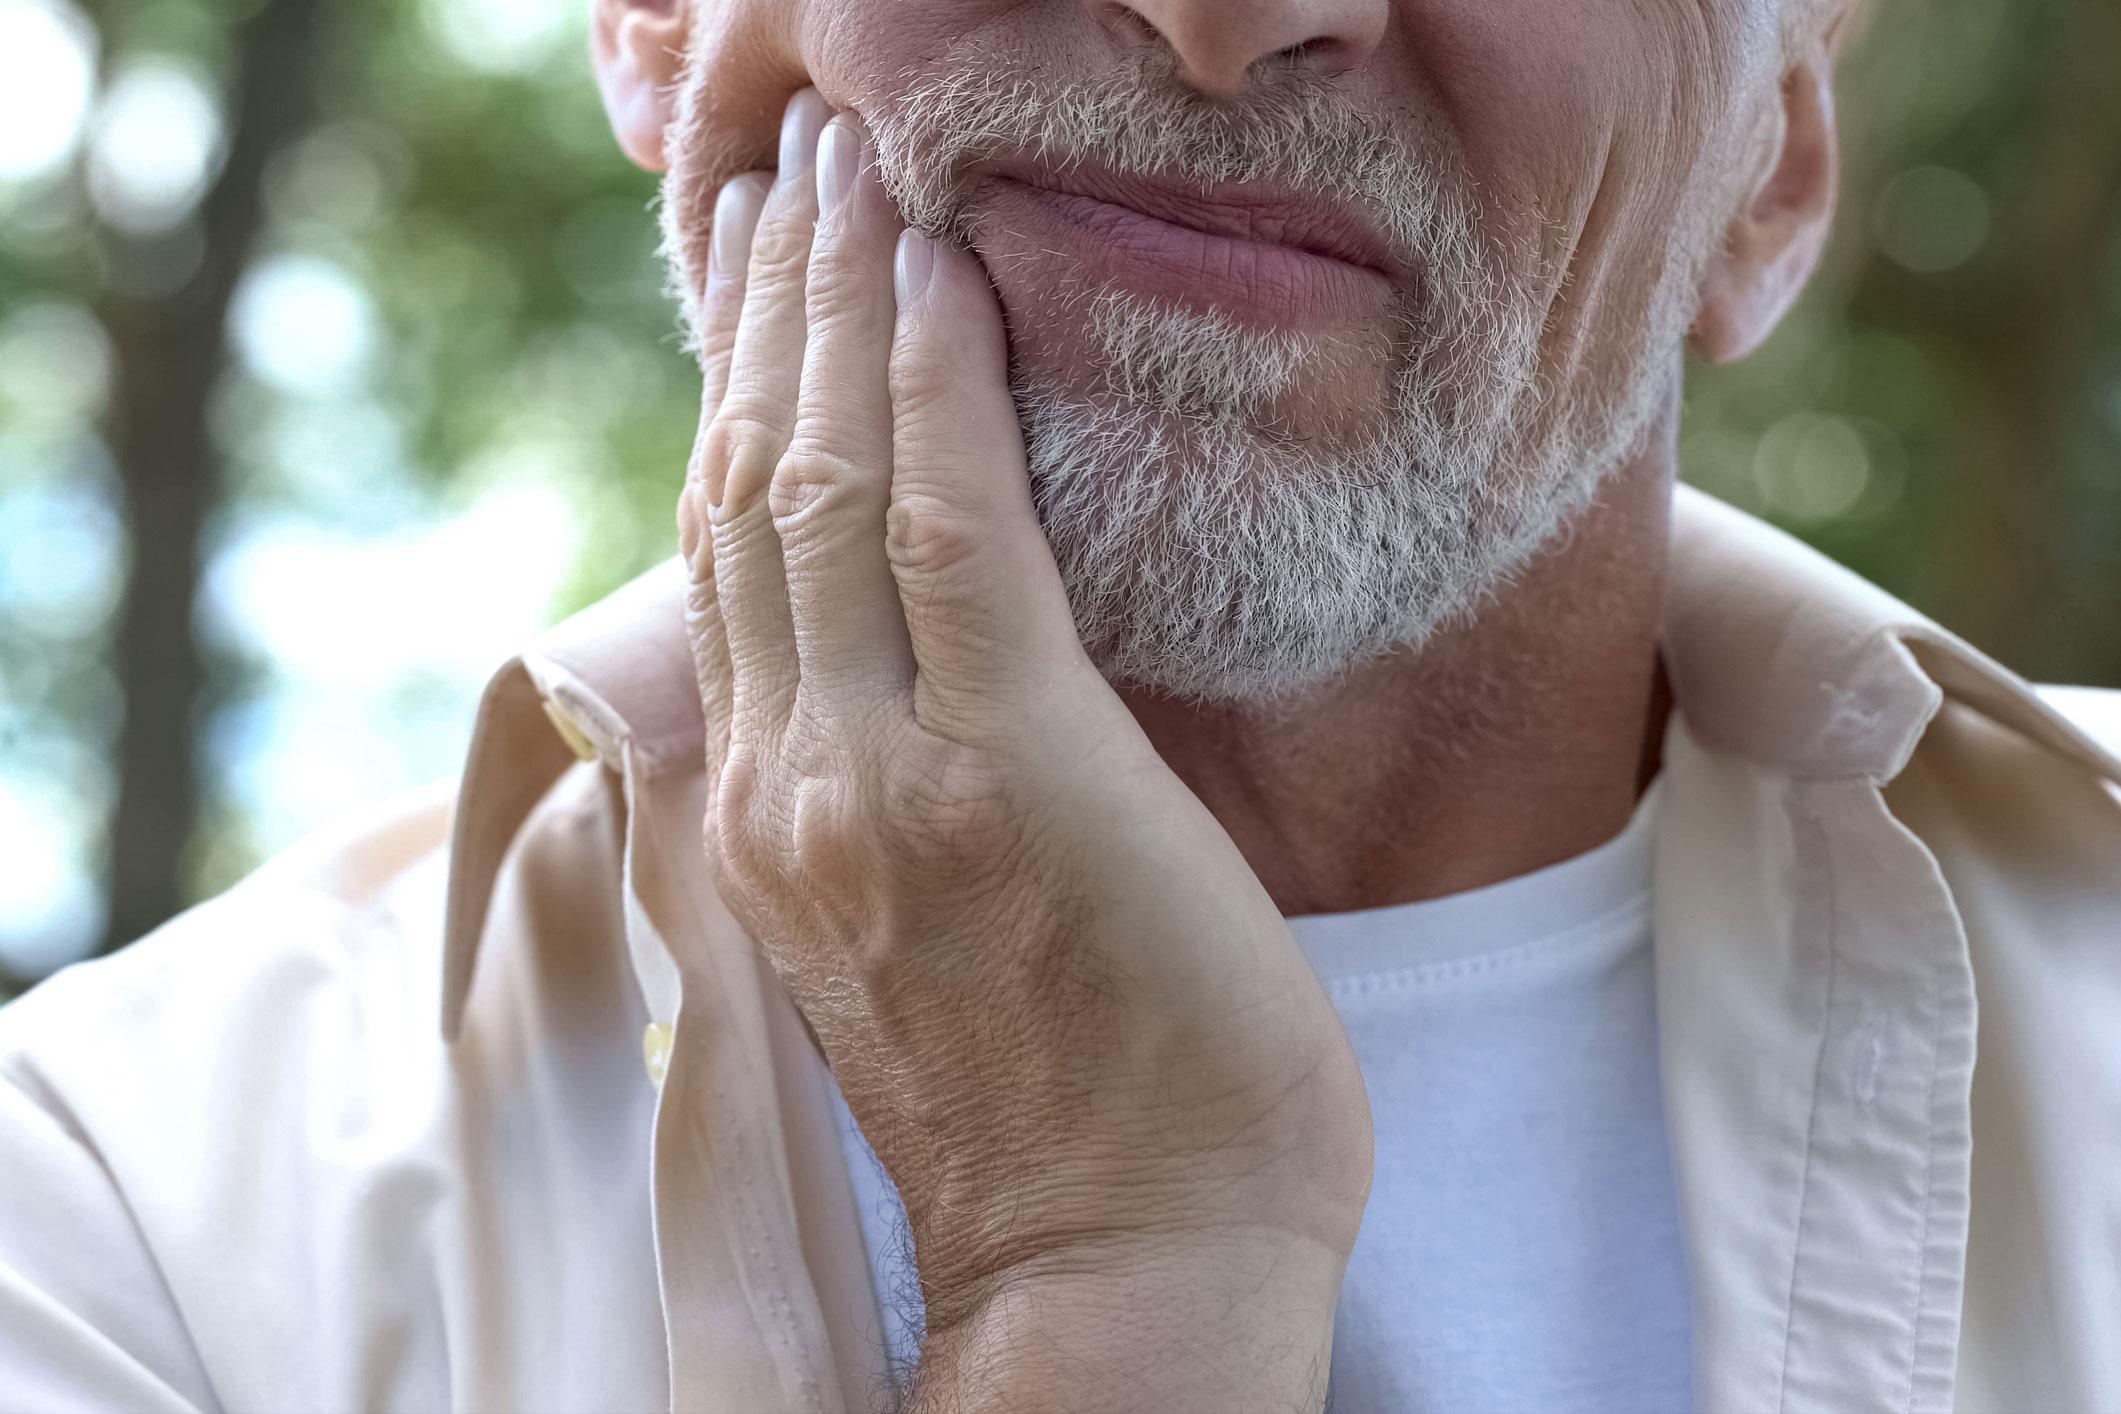 Senior man having problem with teeth,